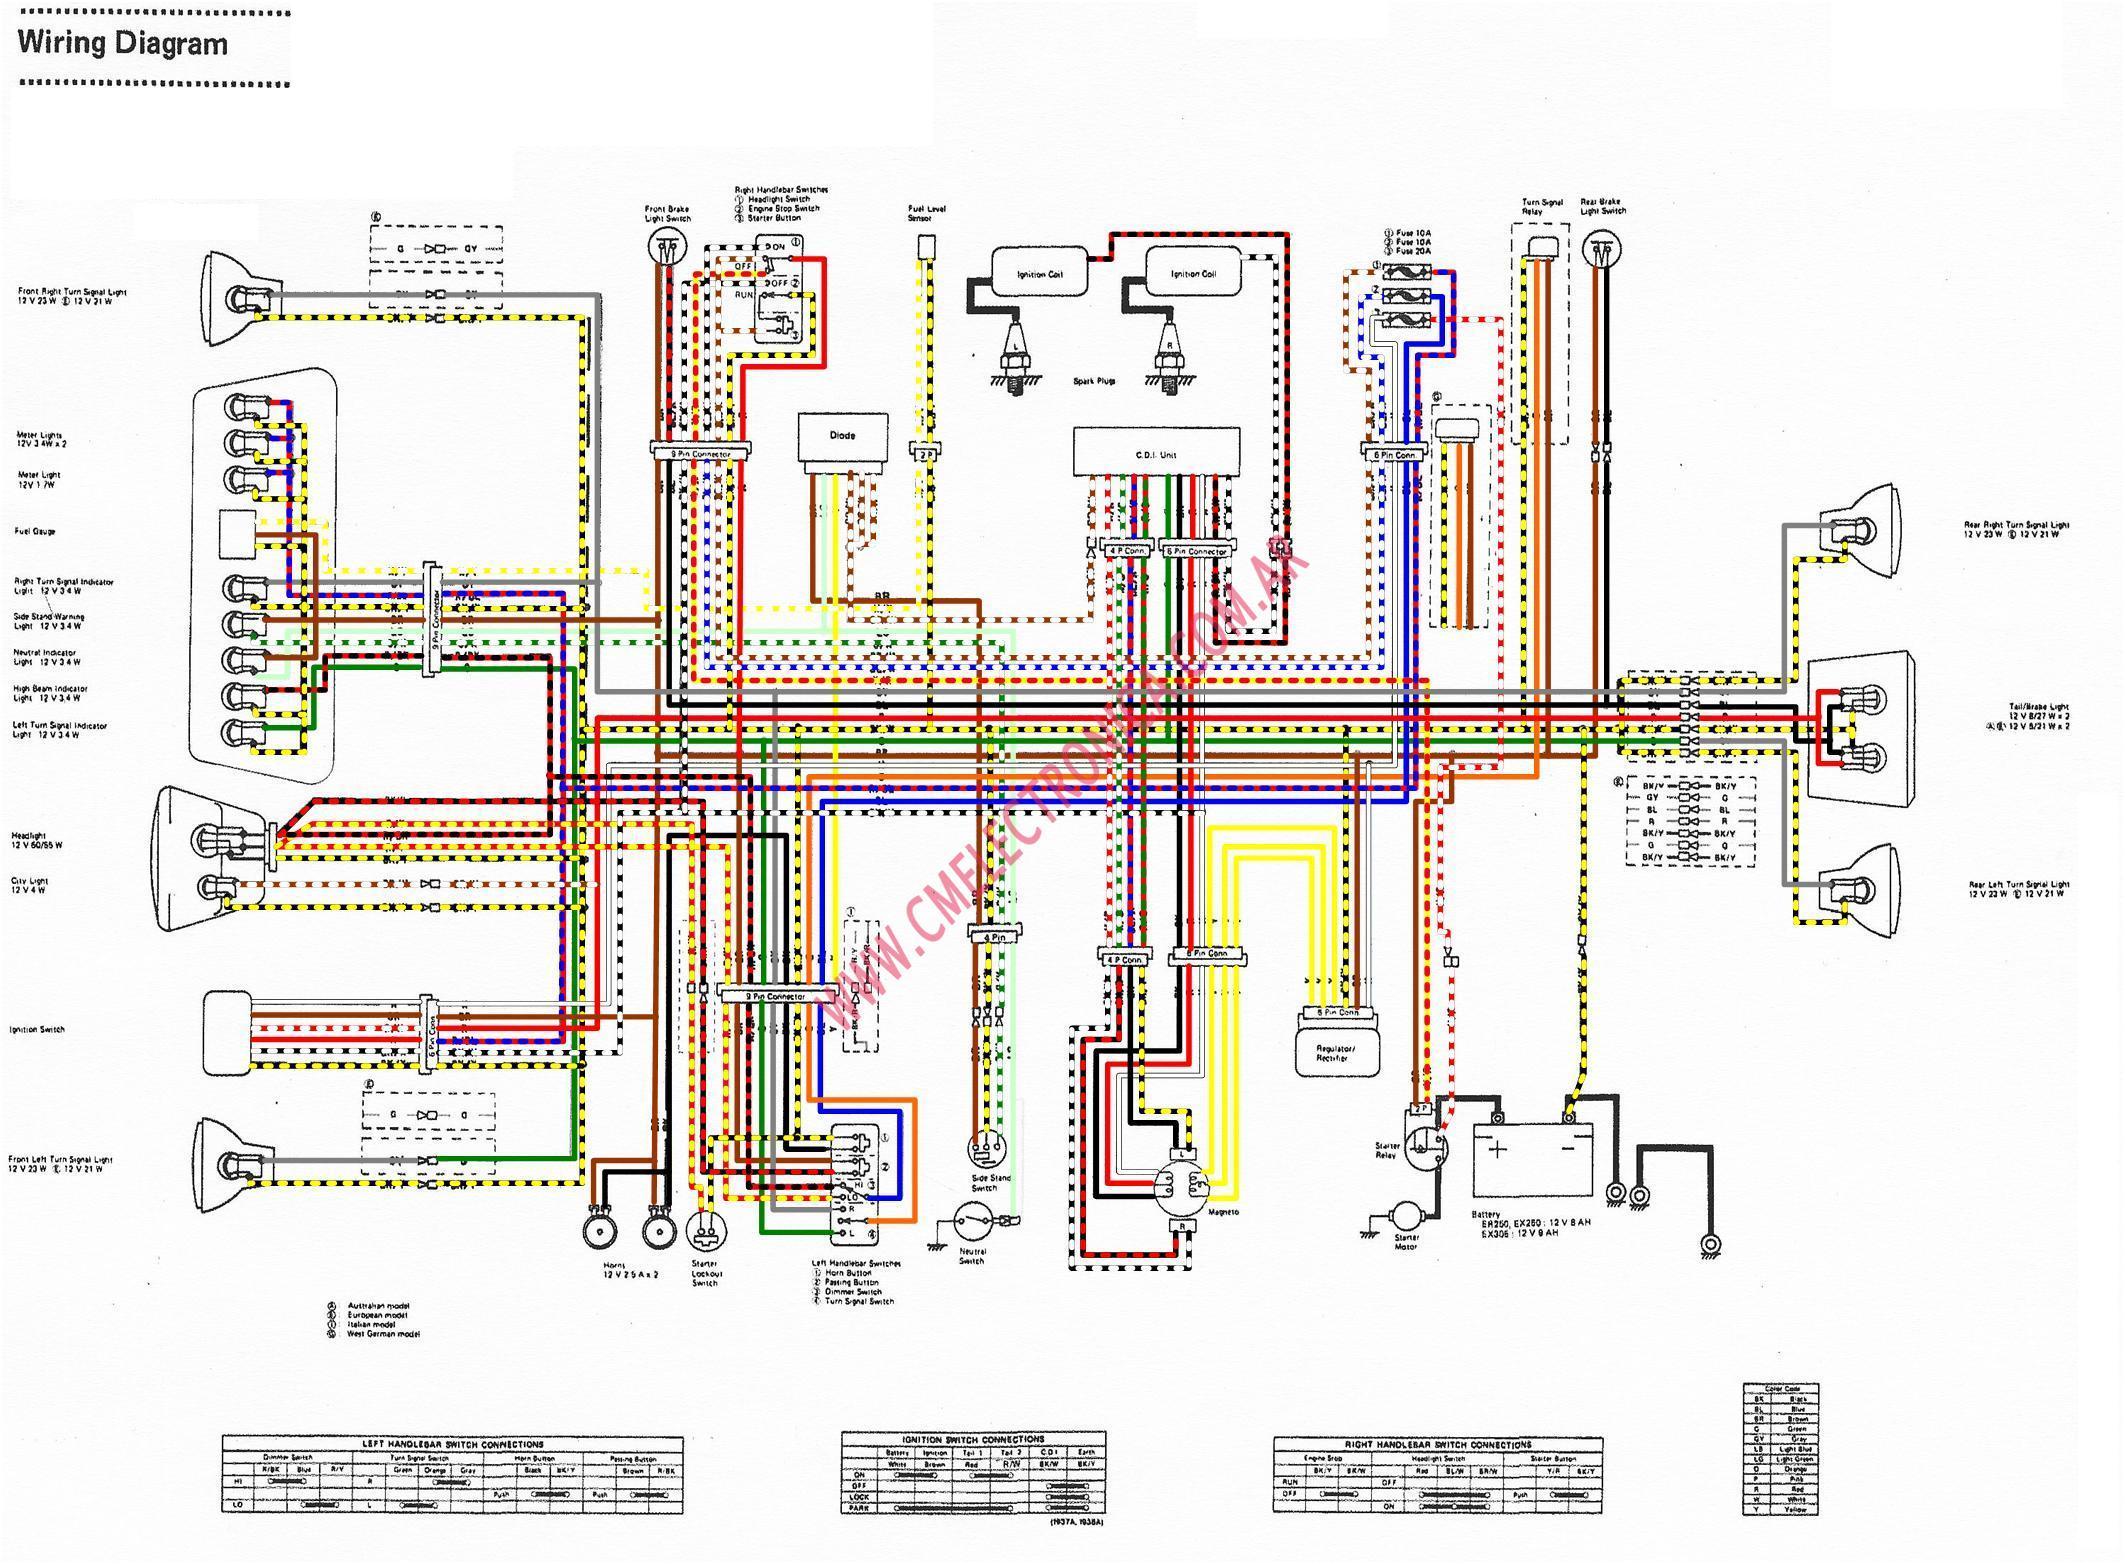 kawasaki ninja 250 ignition wiring diagram